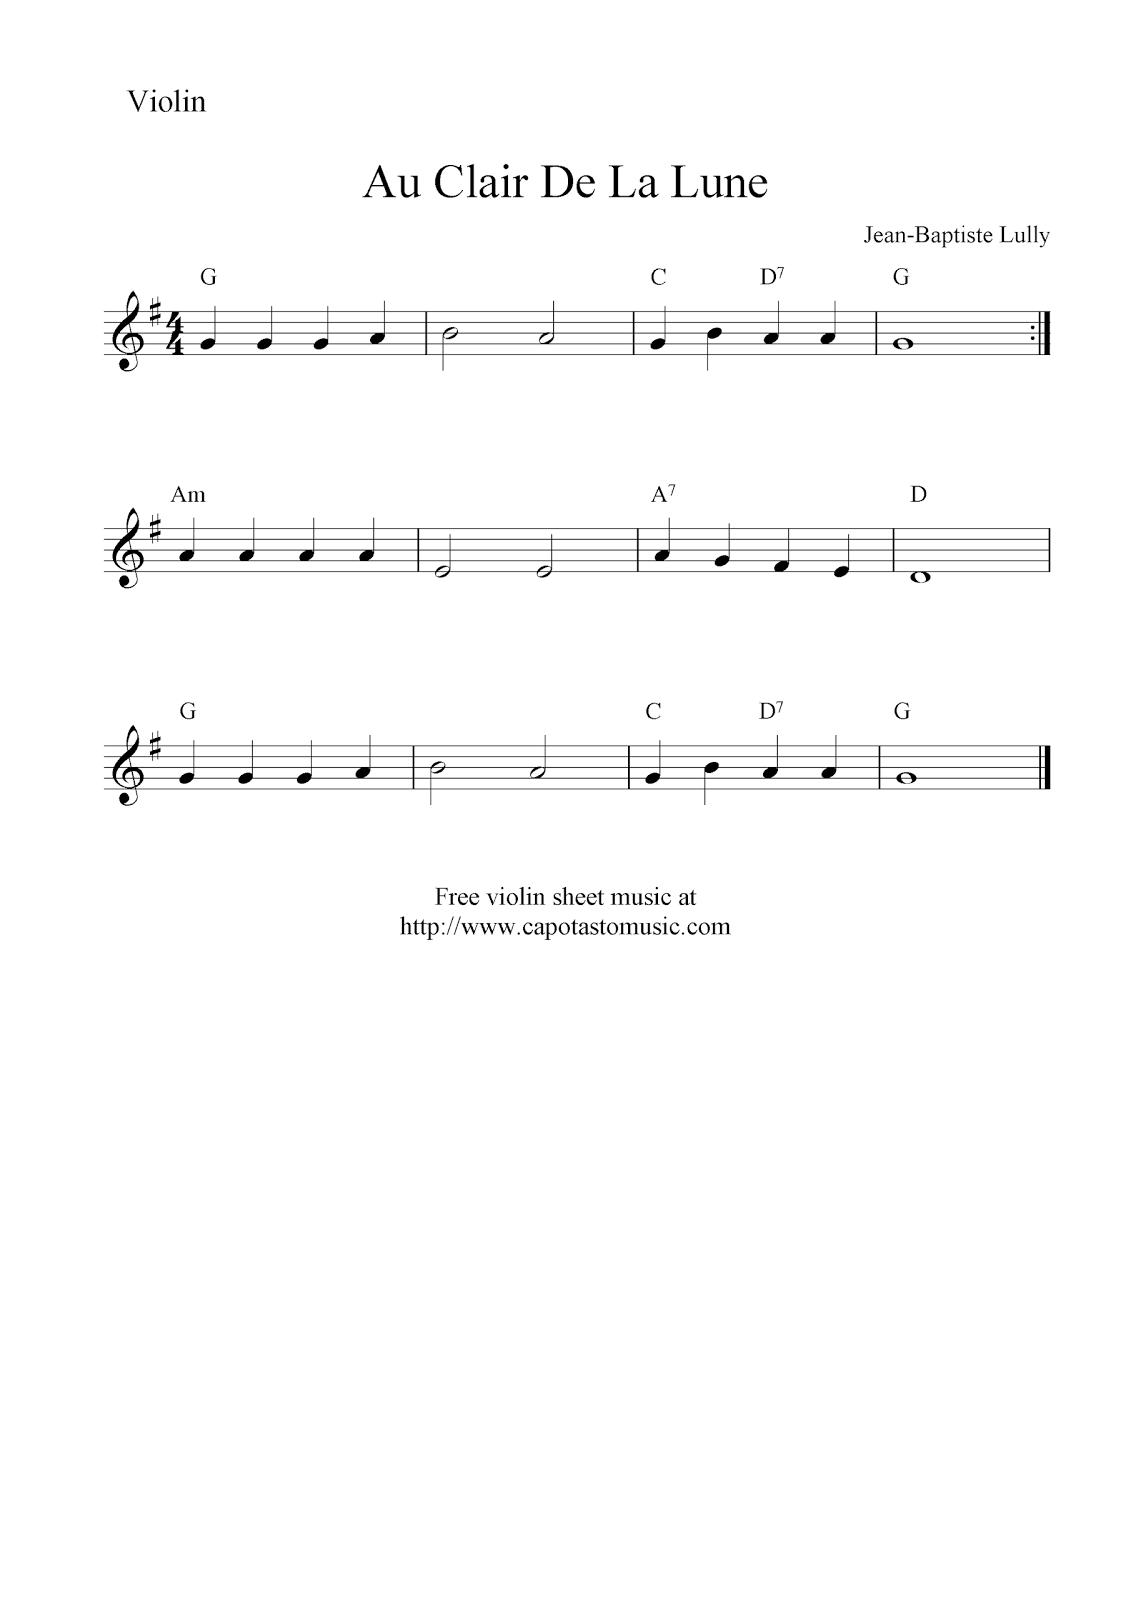 Au Clair De La Lune, Free Violin Sheet Music Notes - Free Printable Australian Notes